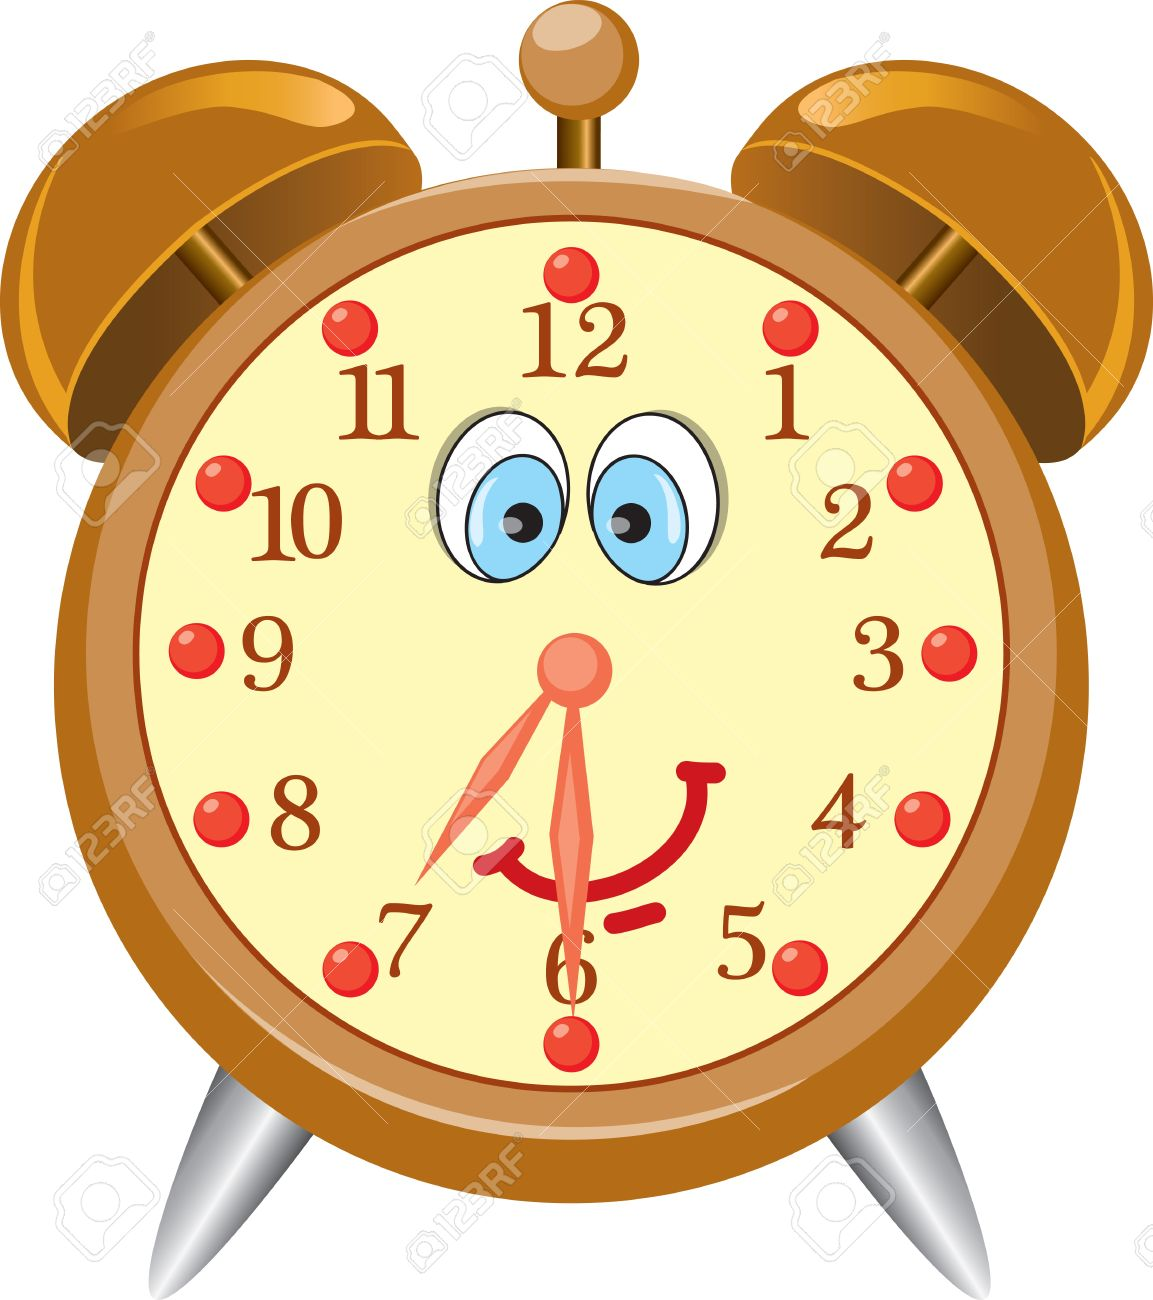 15 Best Alarm Clocks for 2018  Cool Digital Projection